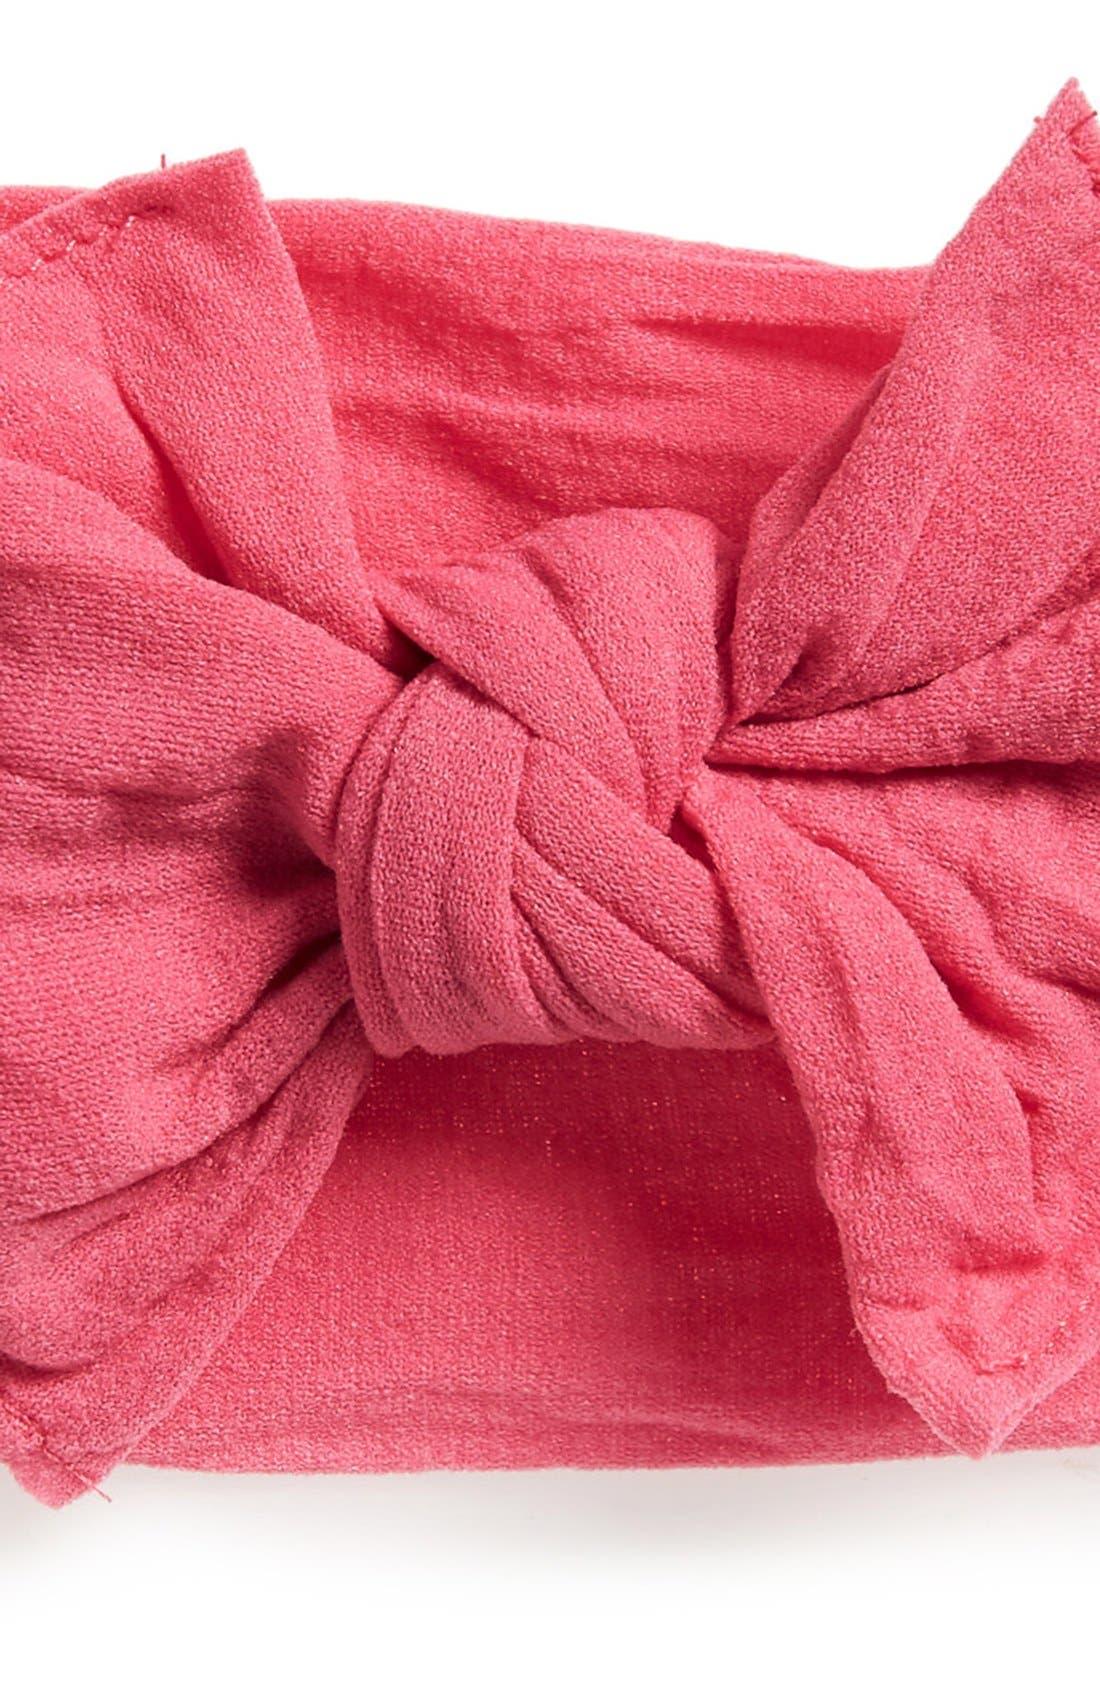 Knot Headbands,                             Alternate thumbnail 3, color,                             PINK